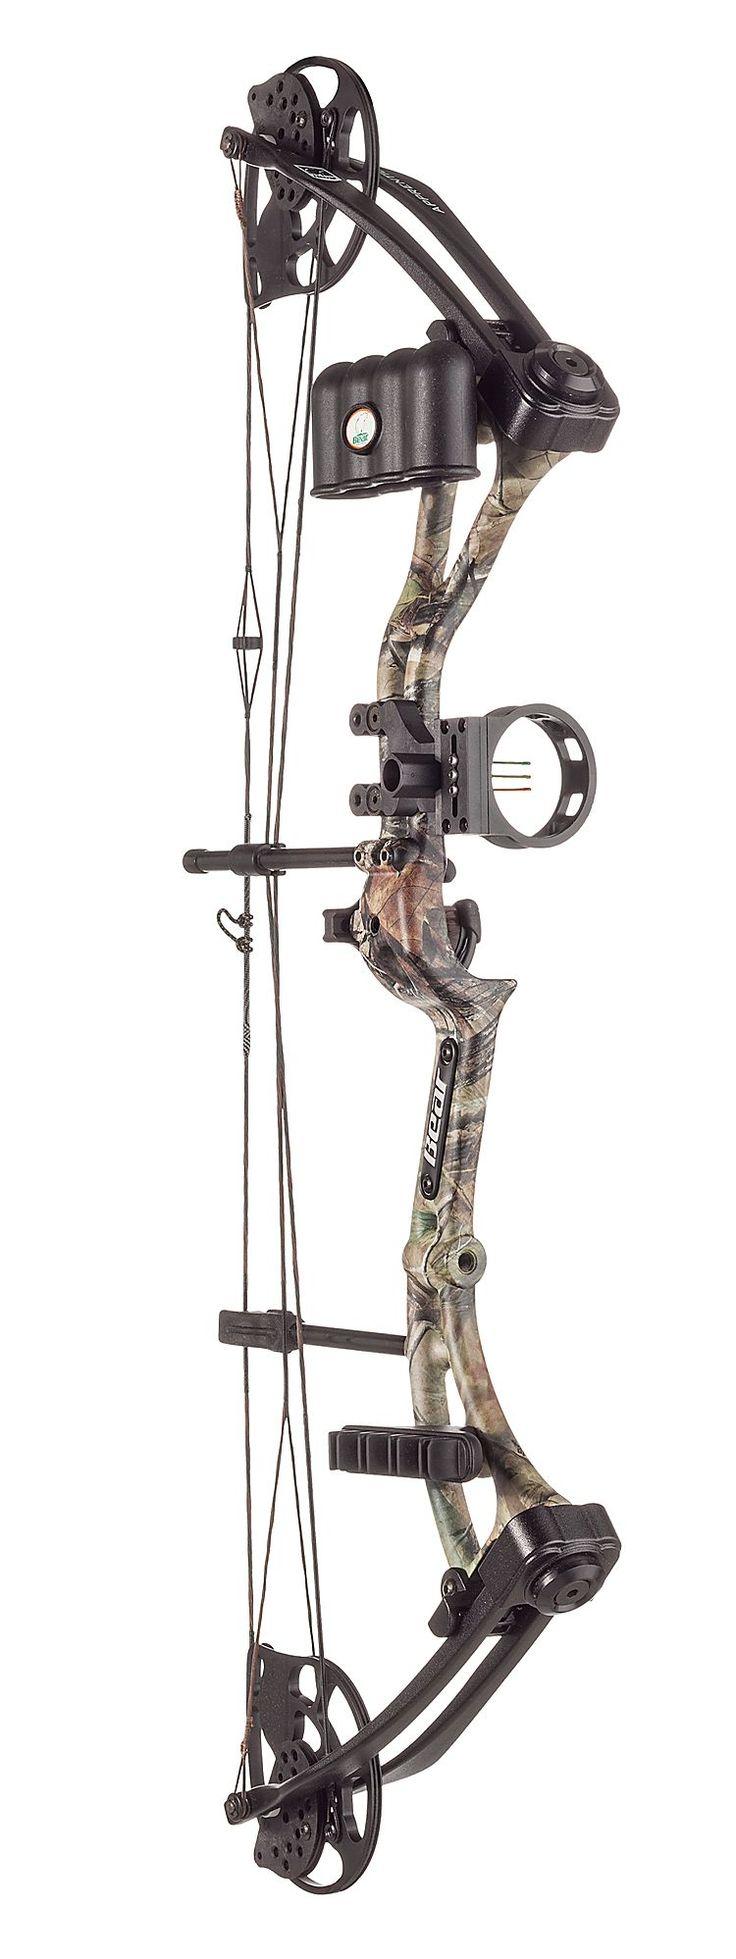 WANT IT..........Bear Archery Apprentice 3 RTH Compound